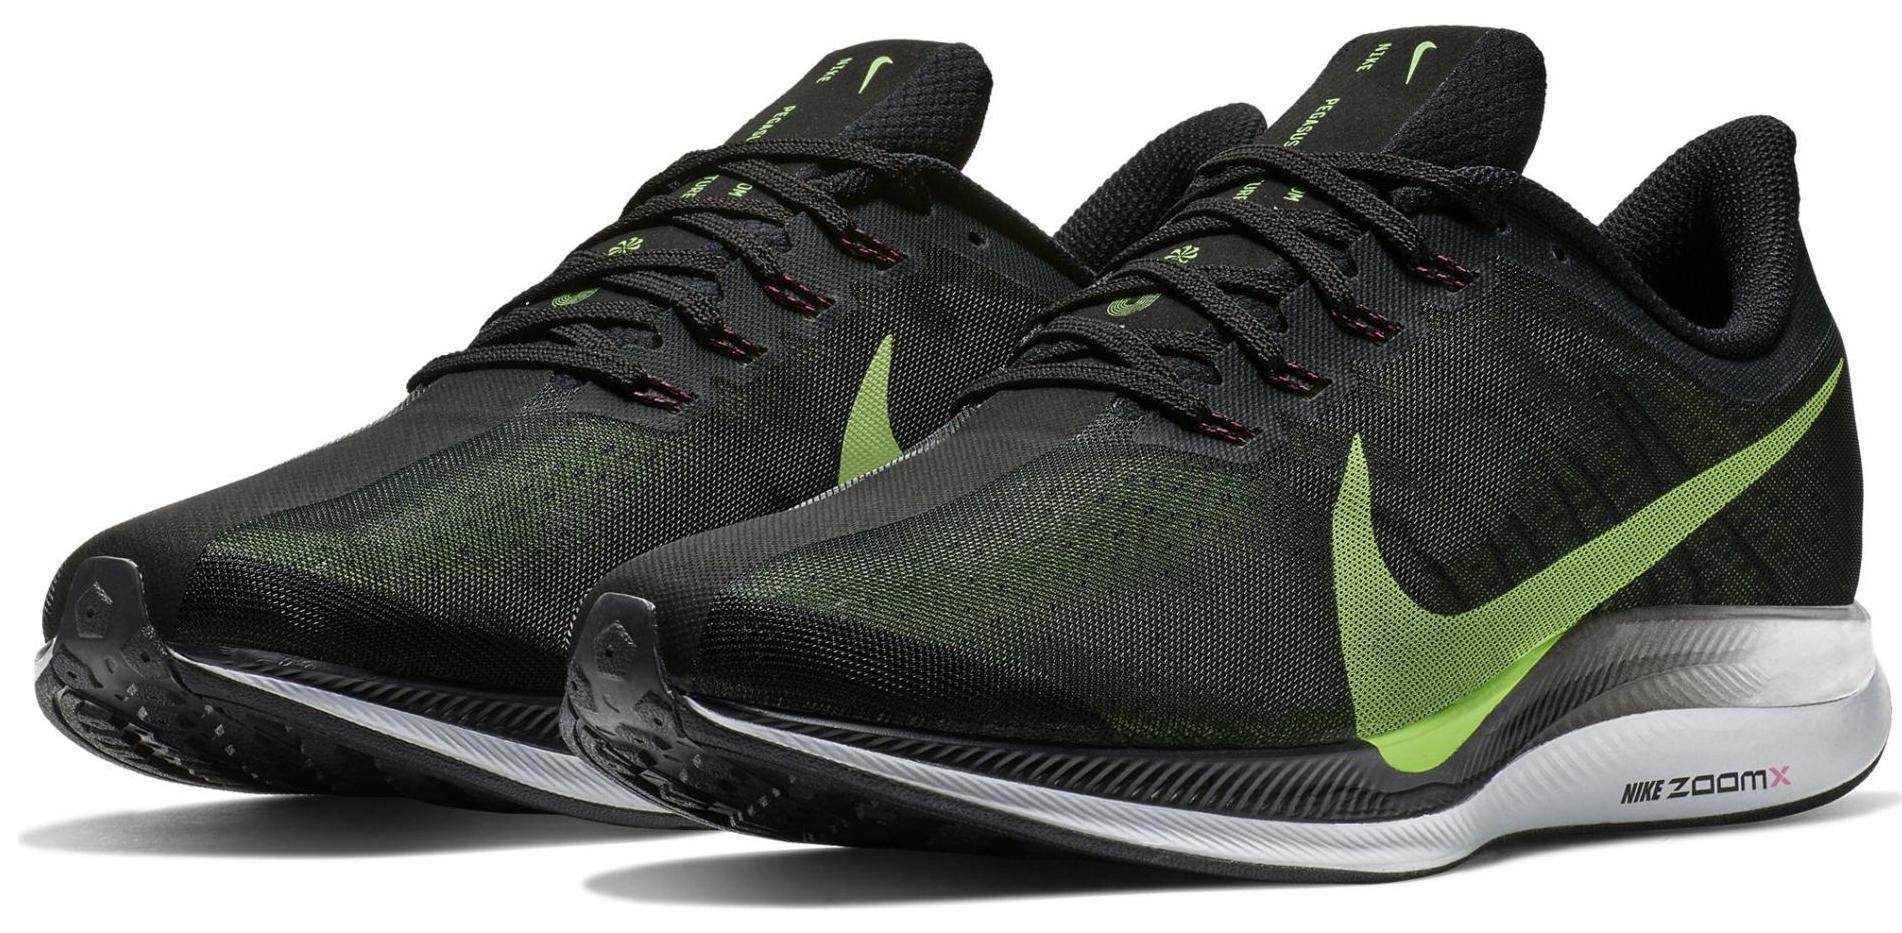 Running Shoe Reviews: Nike Zoom Pegasus 35 Turbo - Runner's ...